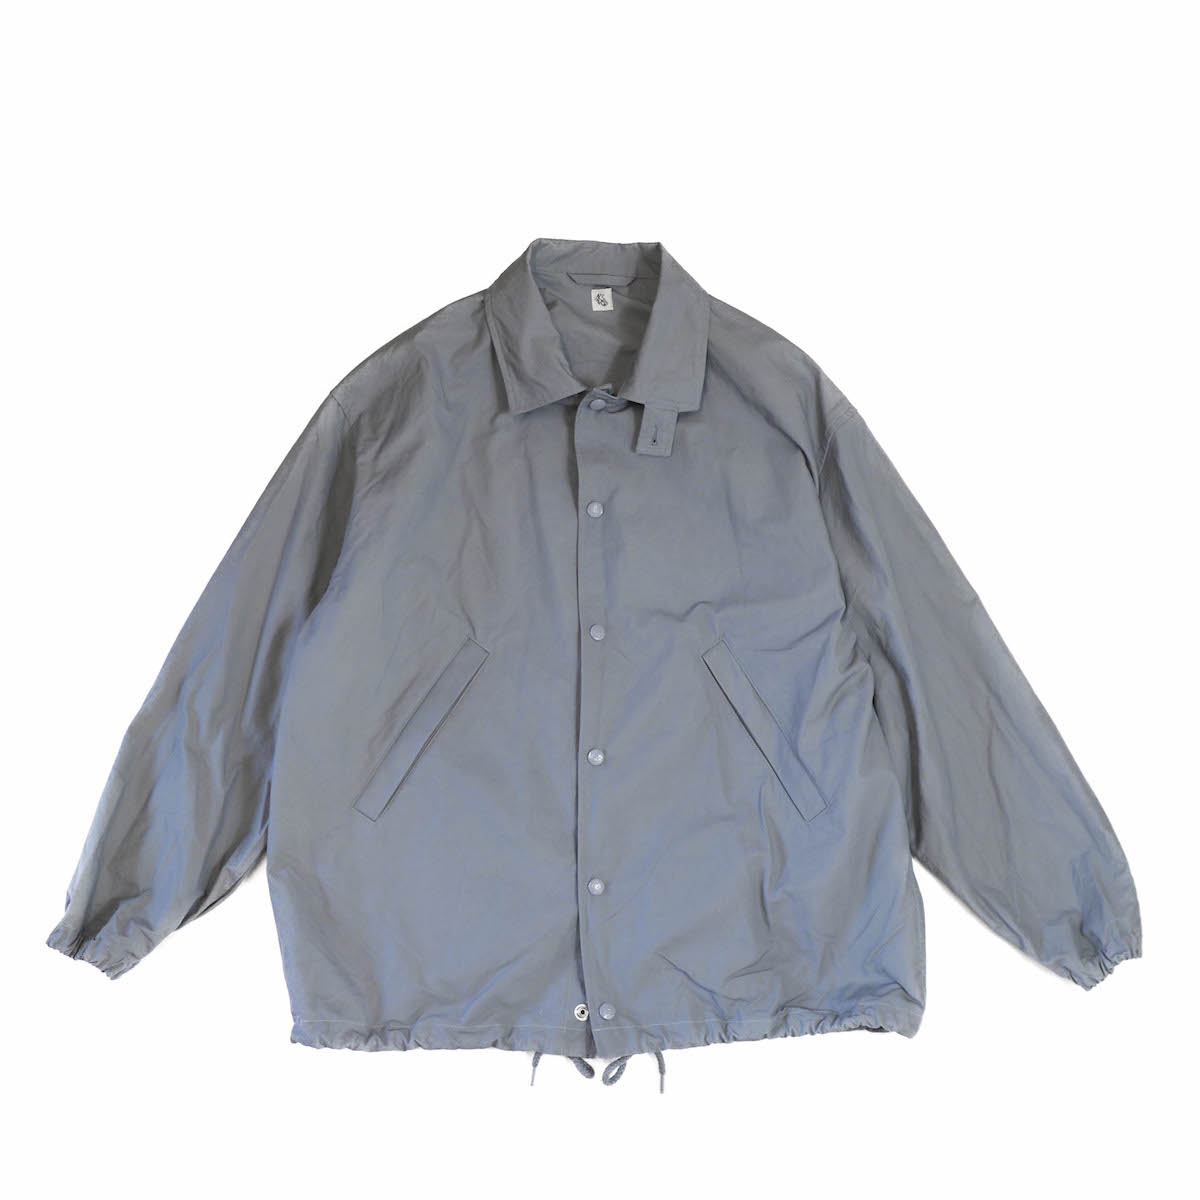 Kaptain Sunshine / Coach Jacket -gray